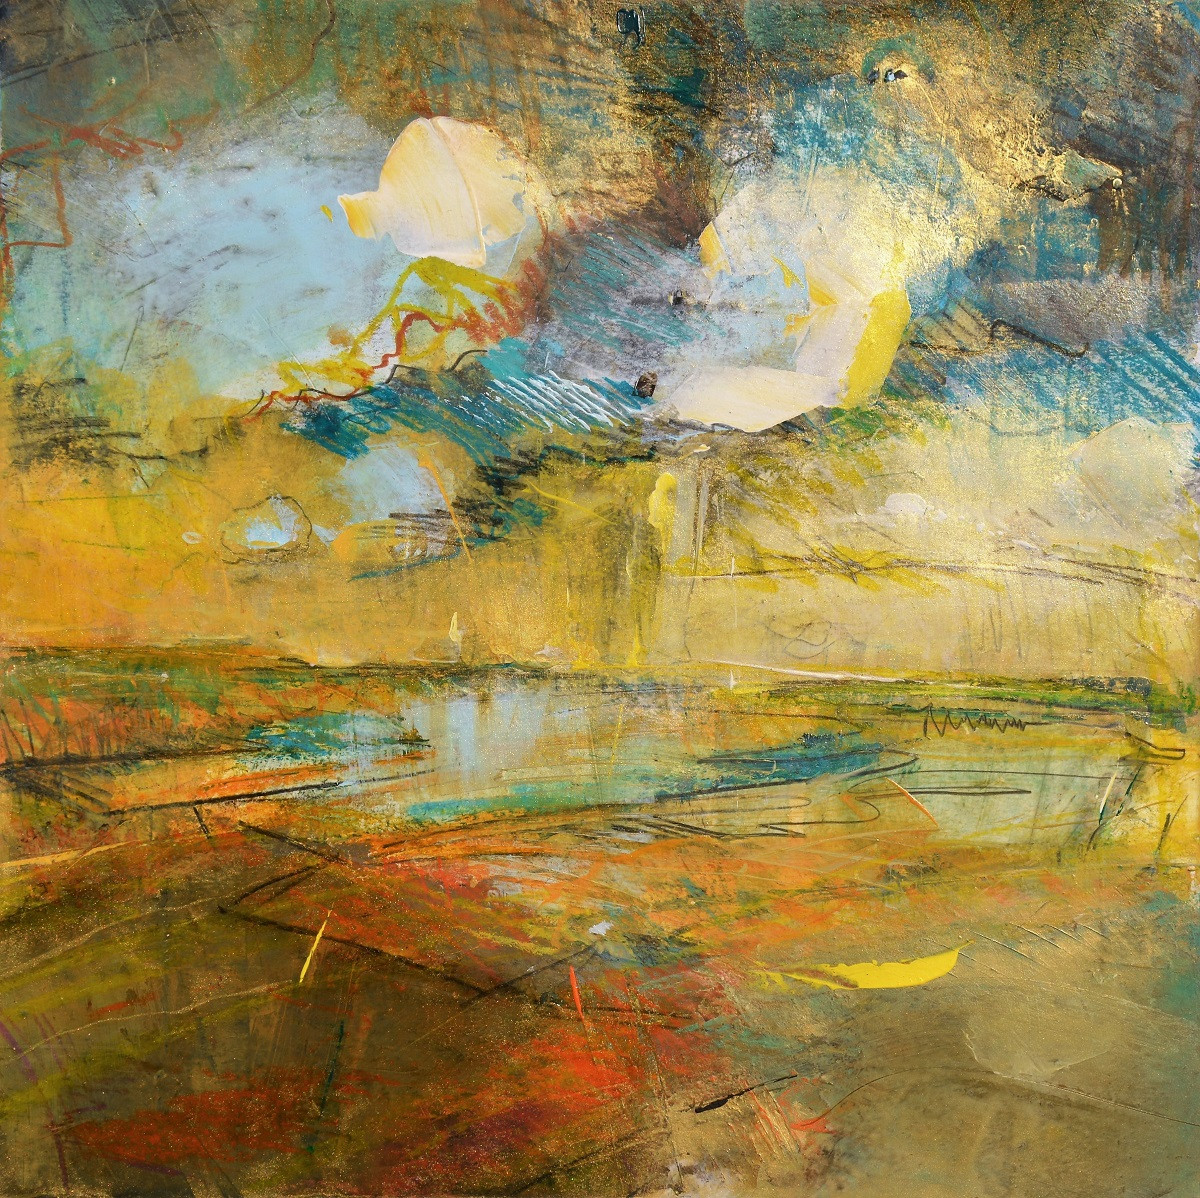 Abstract Landscape Art     Kim McAninch